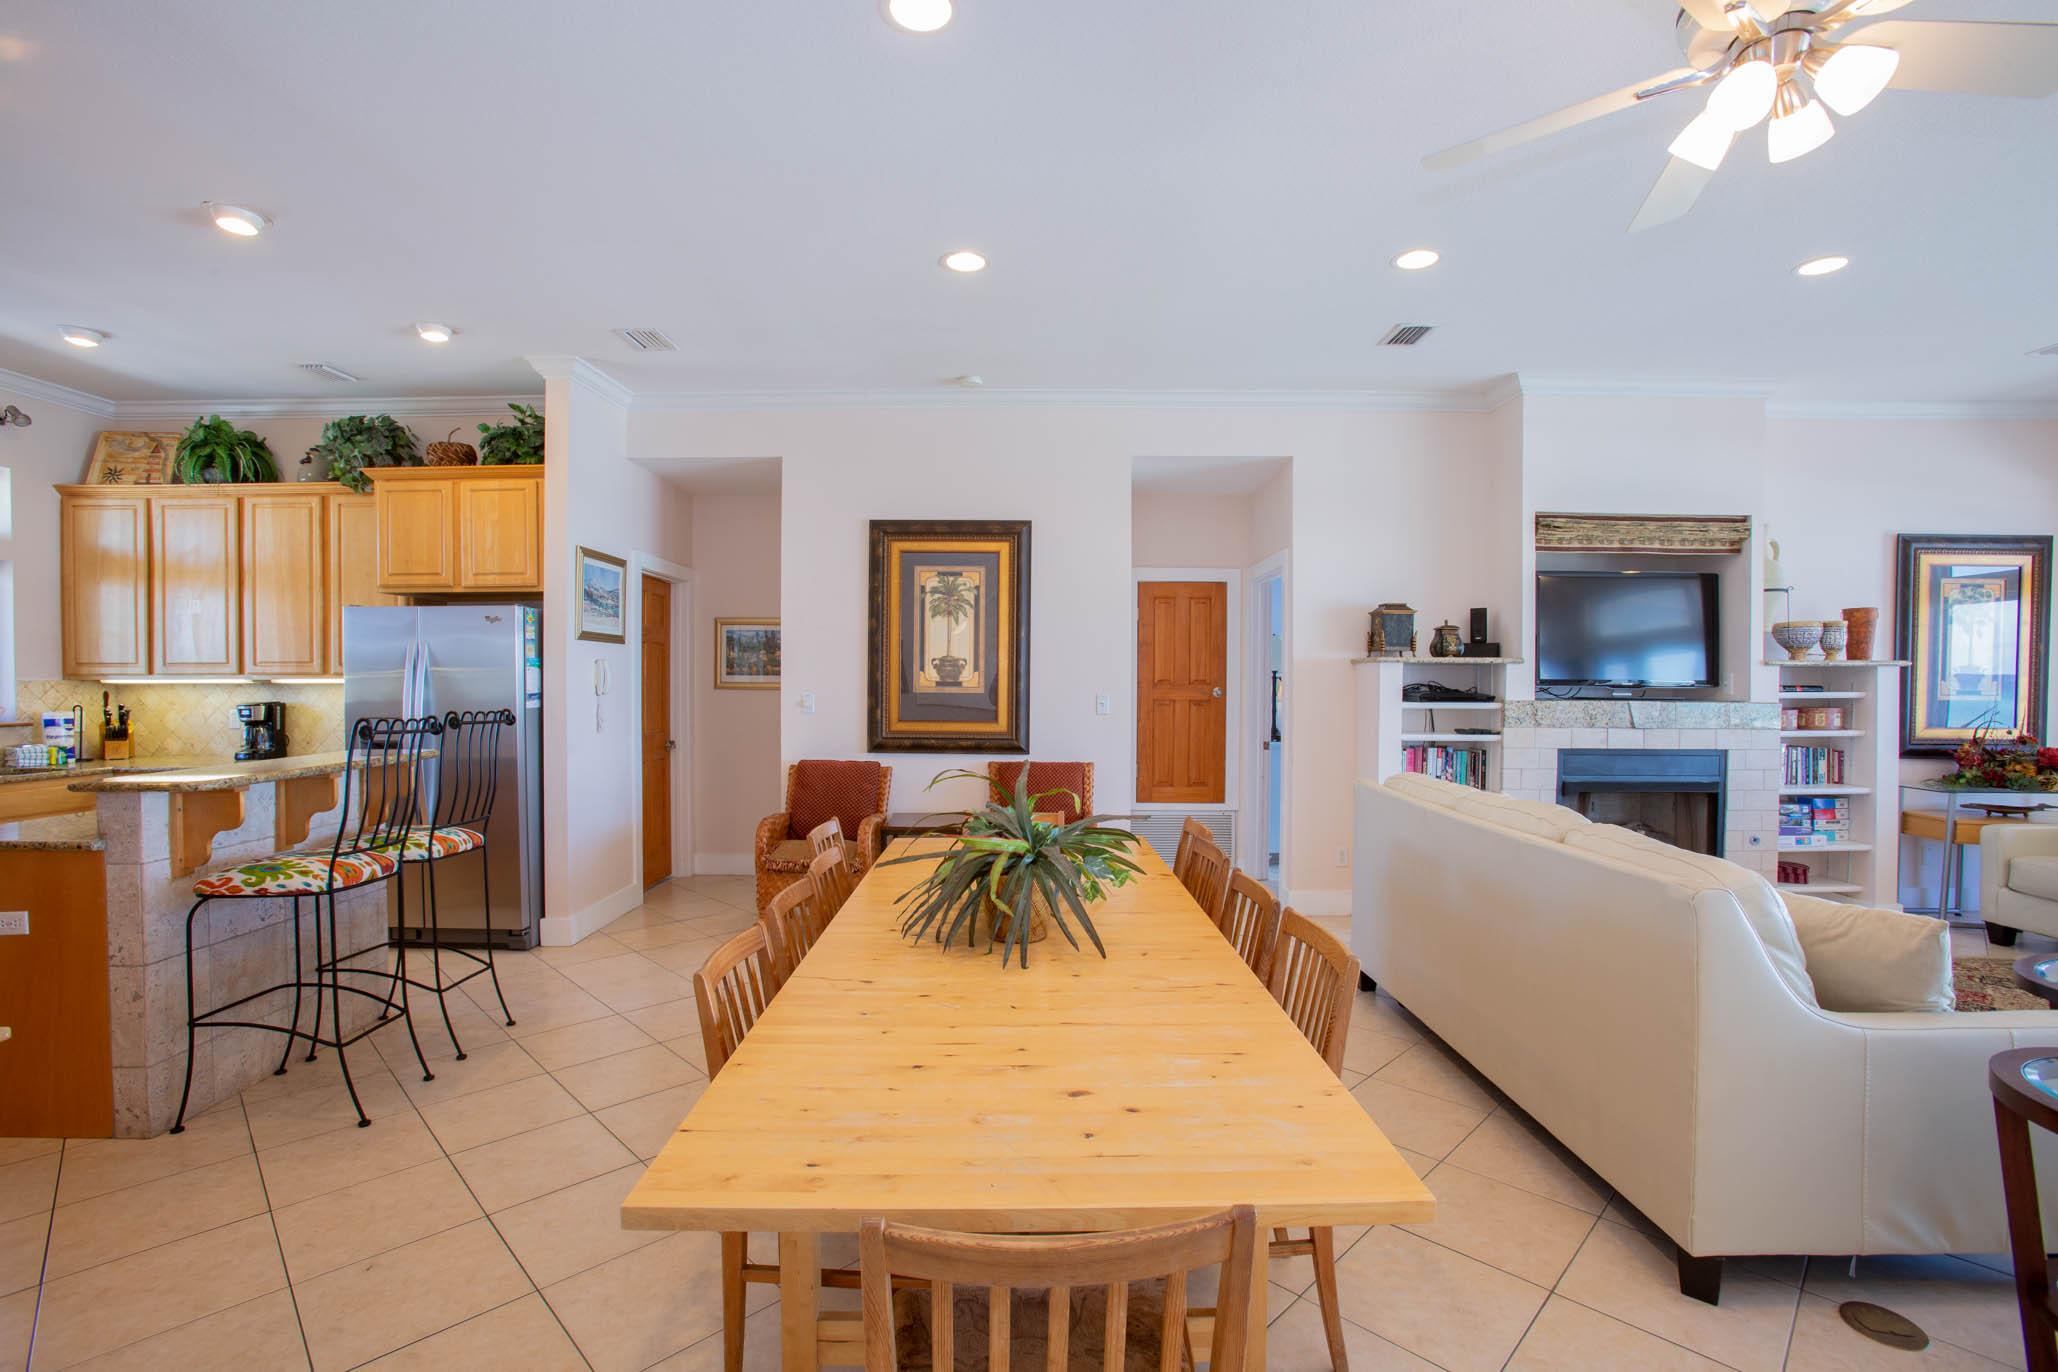 Ariola 1214 House/Cottage rental in Luxury Homes in Pensacola Beach Florida - #14